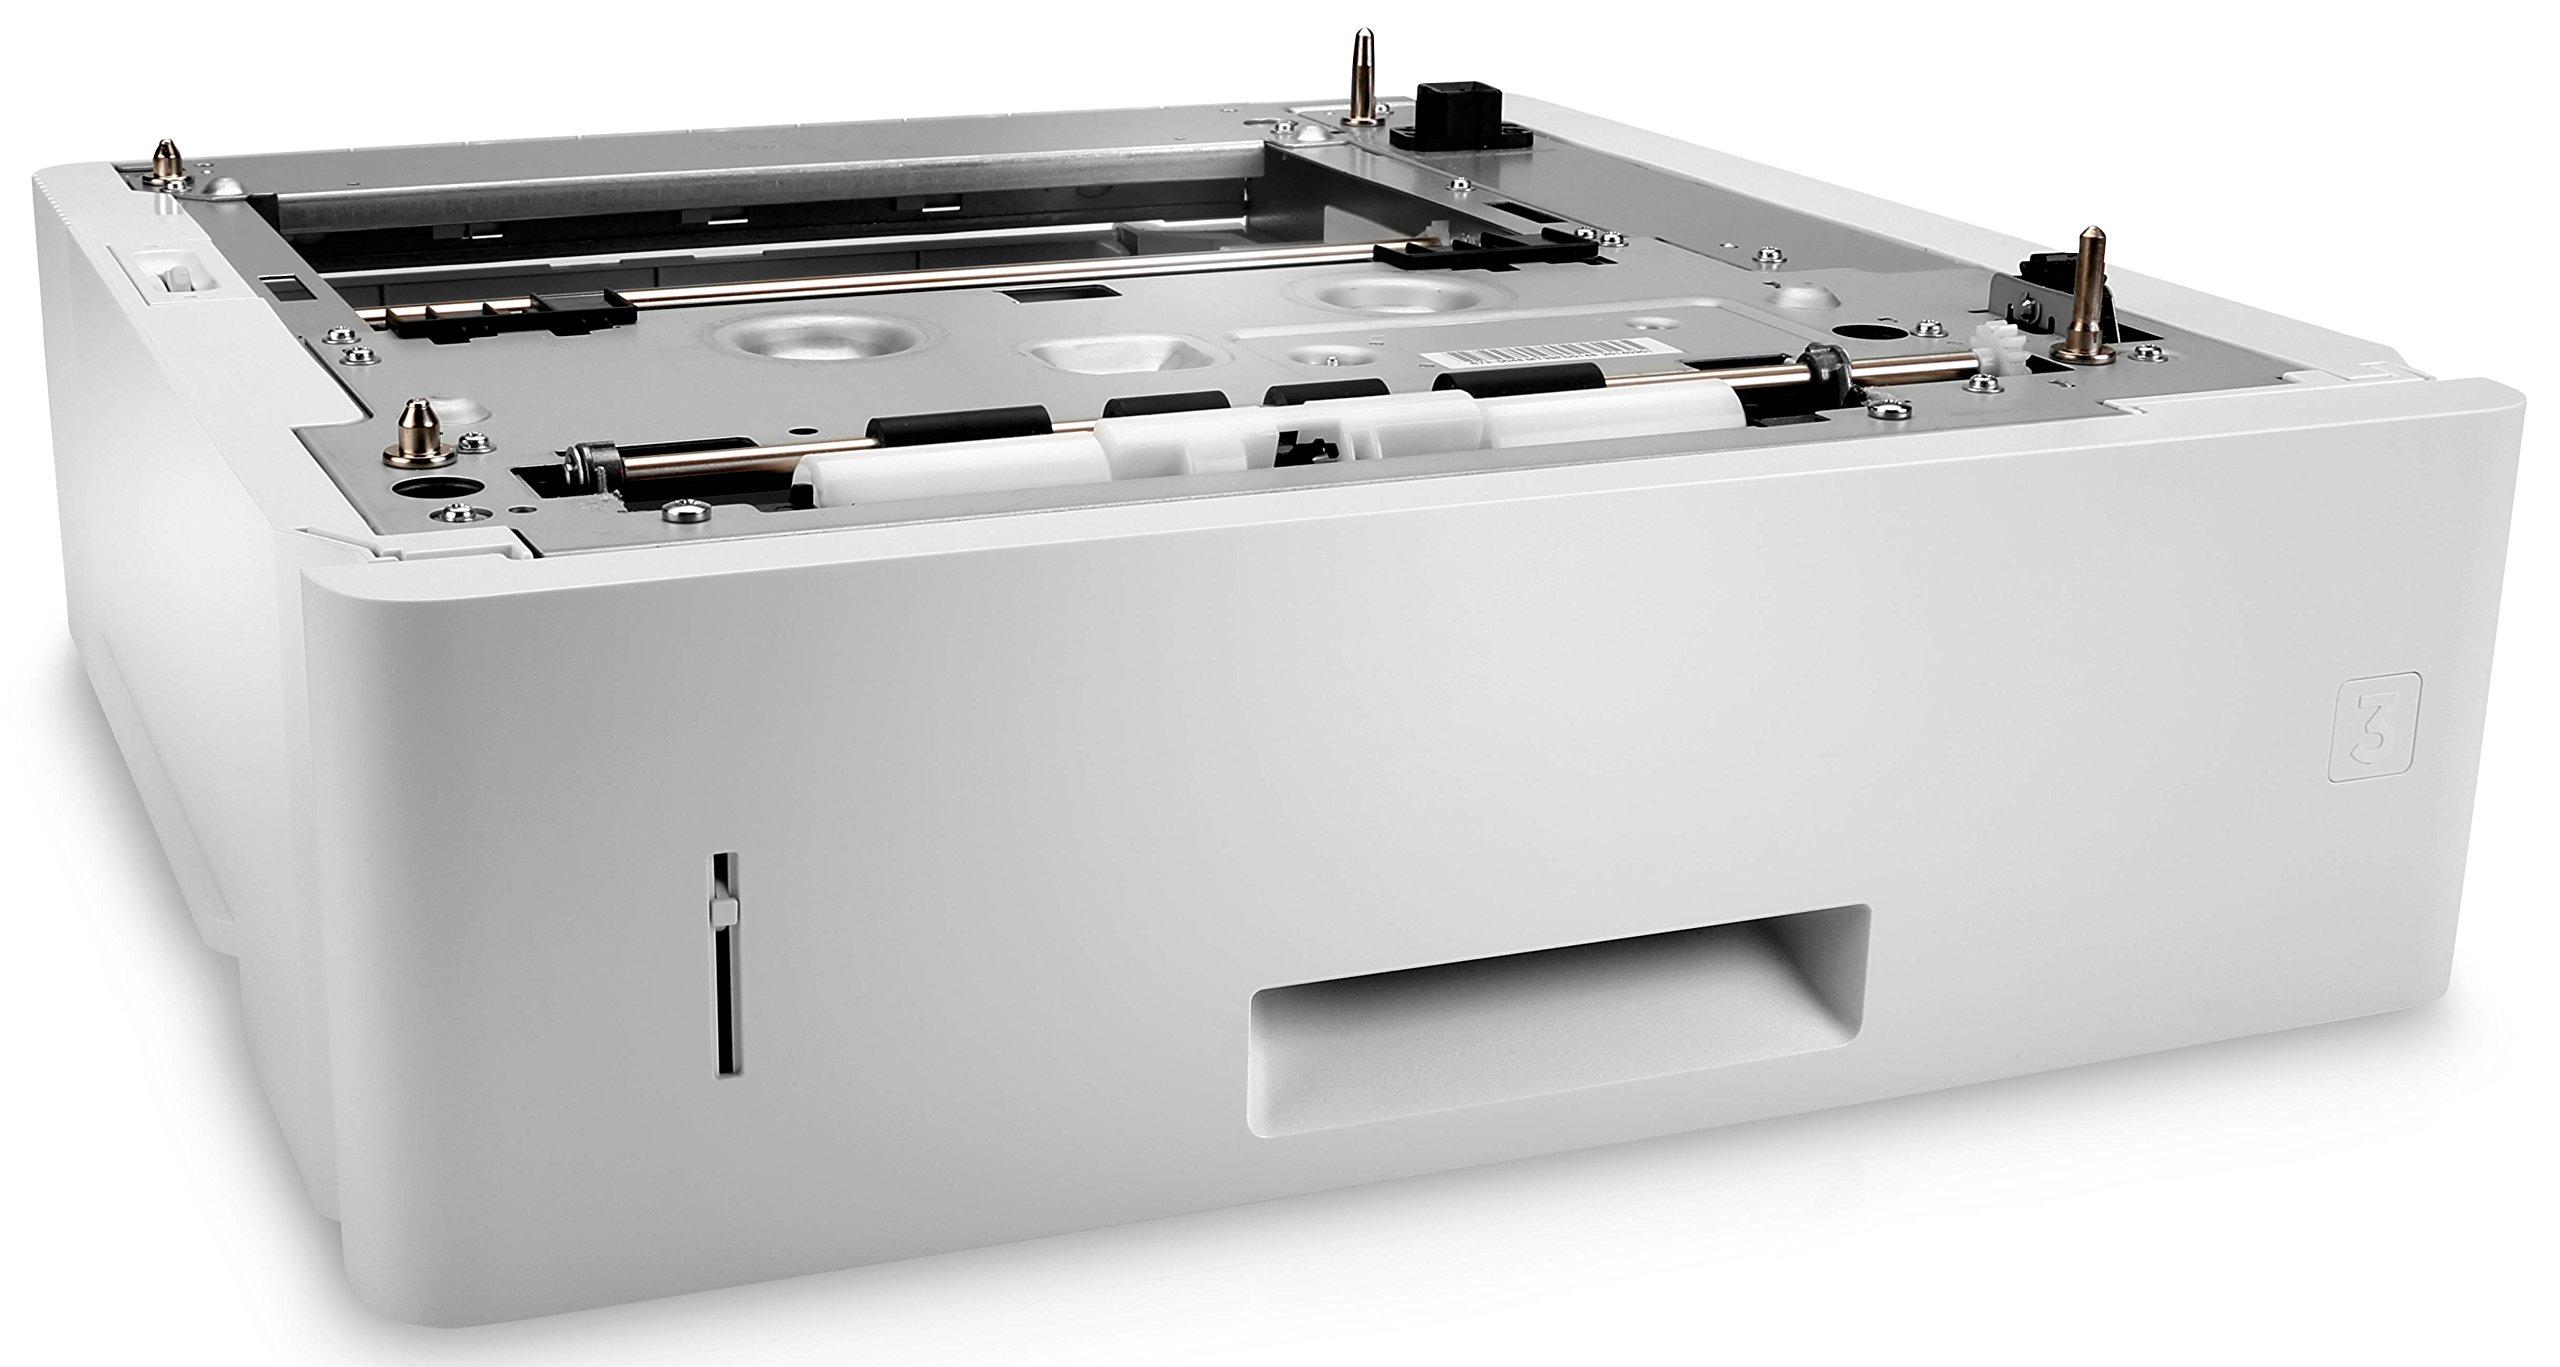 HP F2G68A Media Tray/Feeder - 500 Sheets by HP